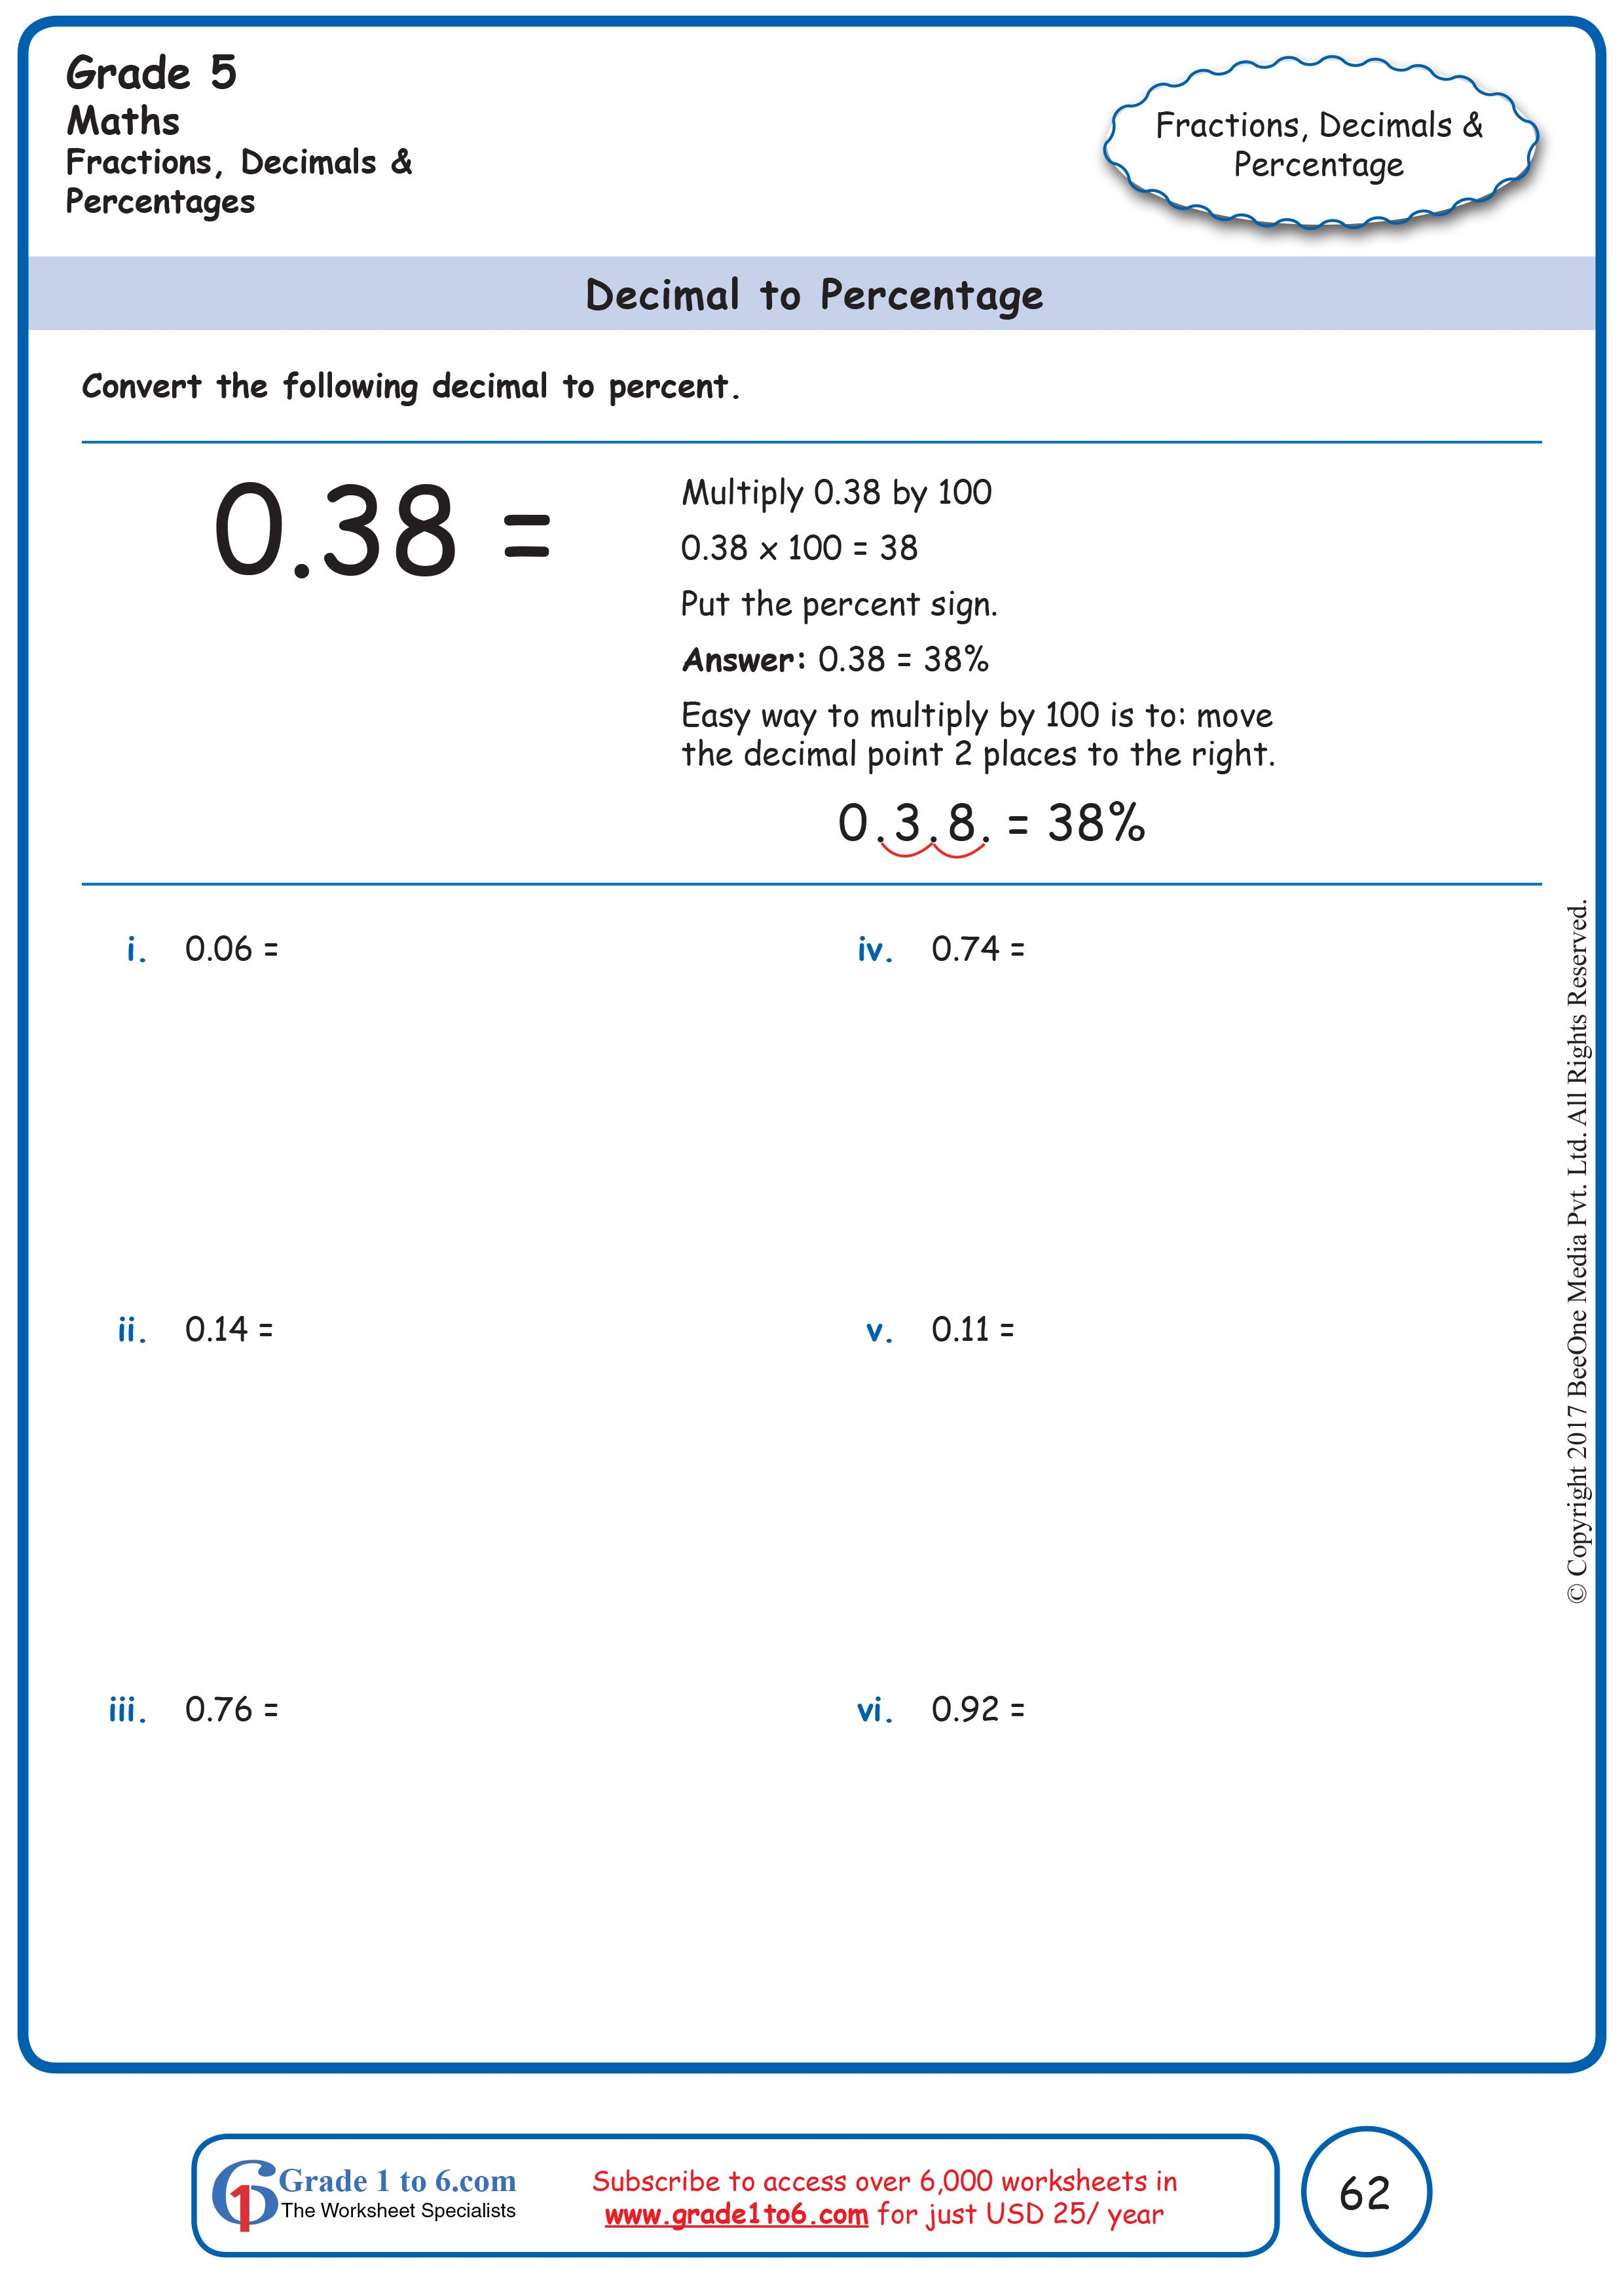 medium resolution of Science \u0026 Math Decimals Grade 6 Workbook Books elektroelement.com.mk